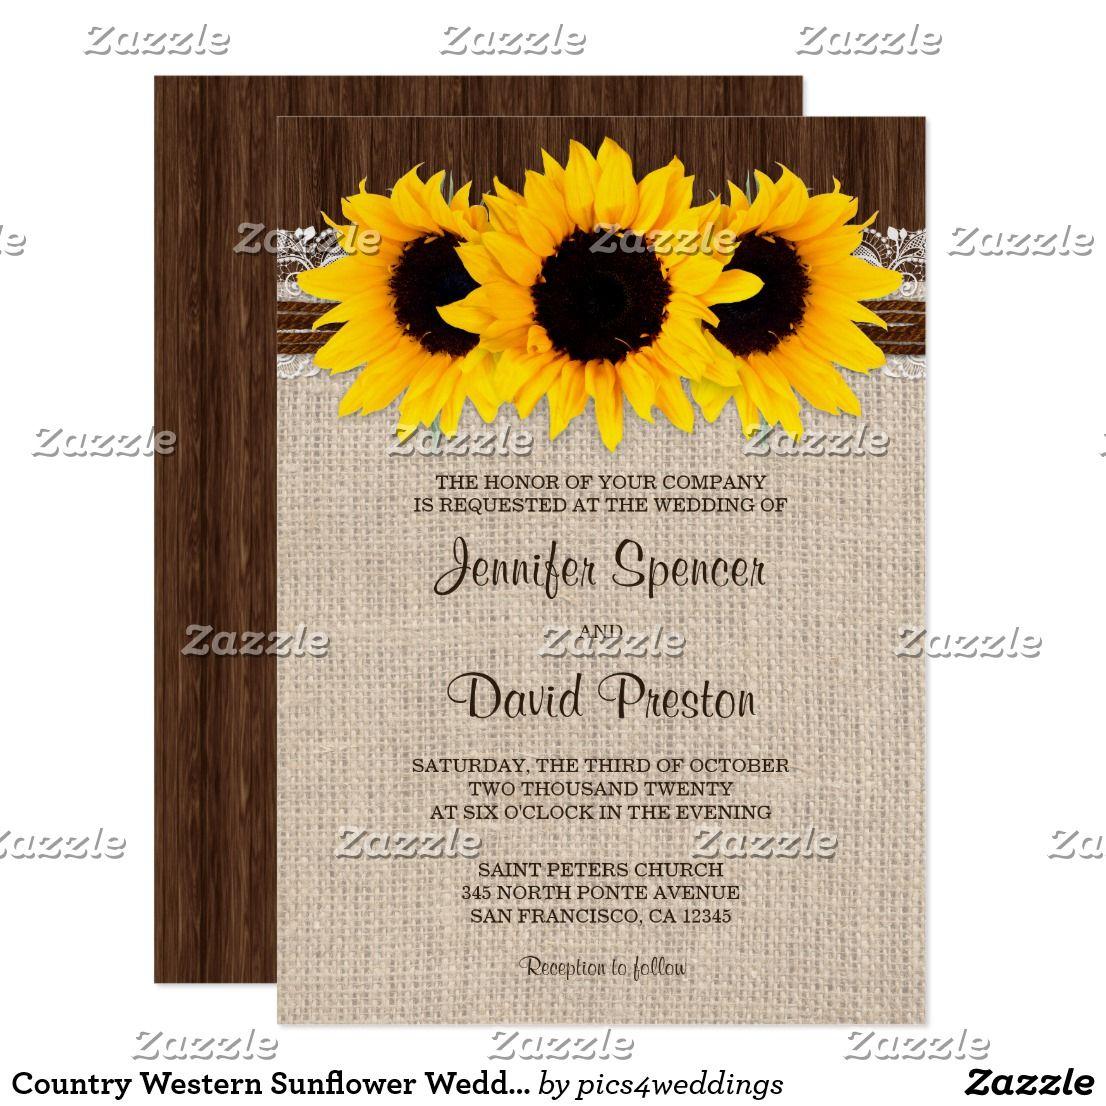 Country Western Sunflower Wedding Invitation